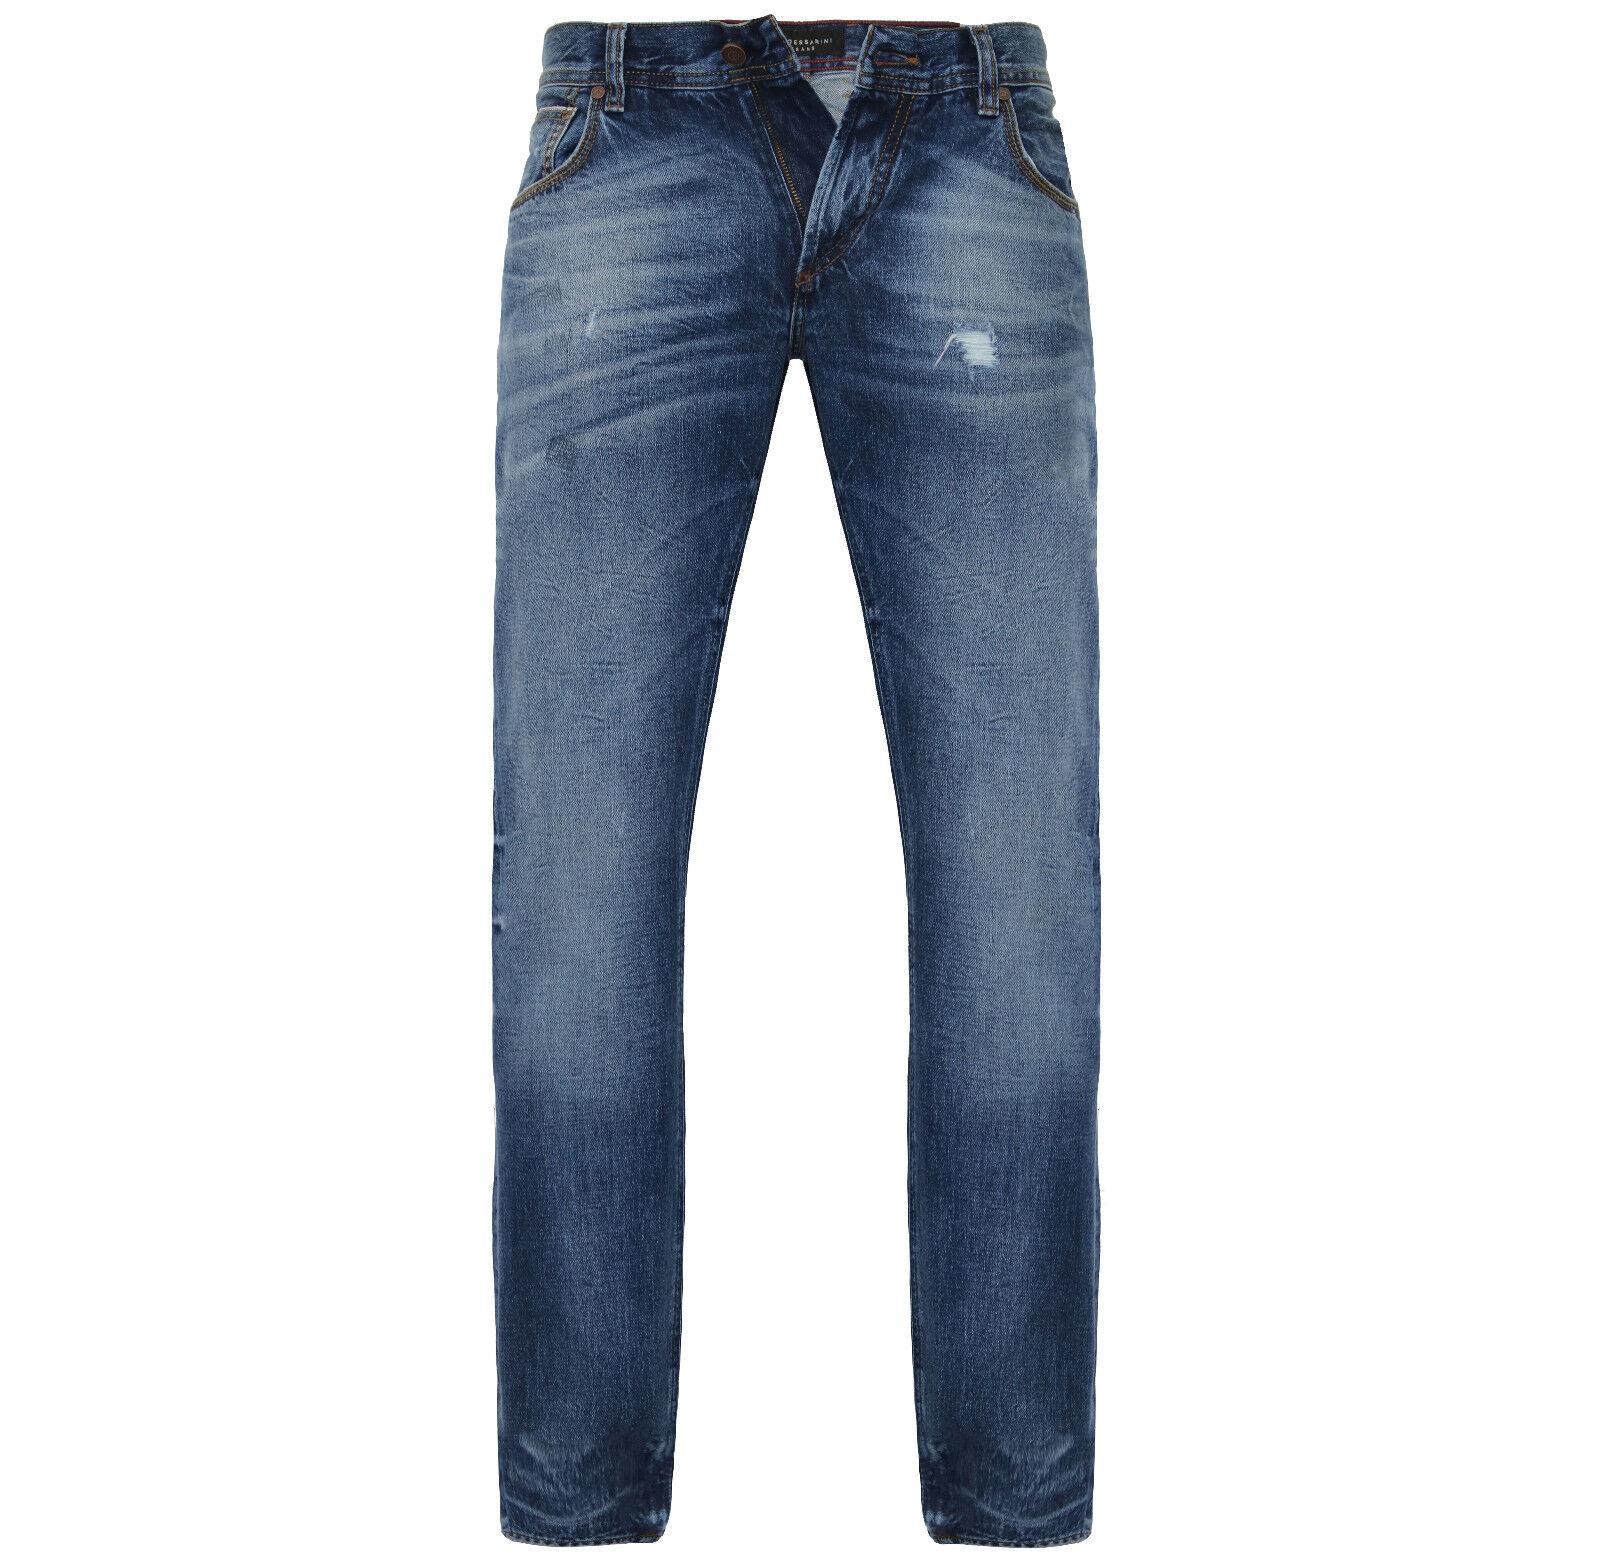 Baldessarini  Hose Jeans  JEFF W34 L34  EDEL NEU SLIM FIT Made in ITALY